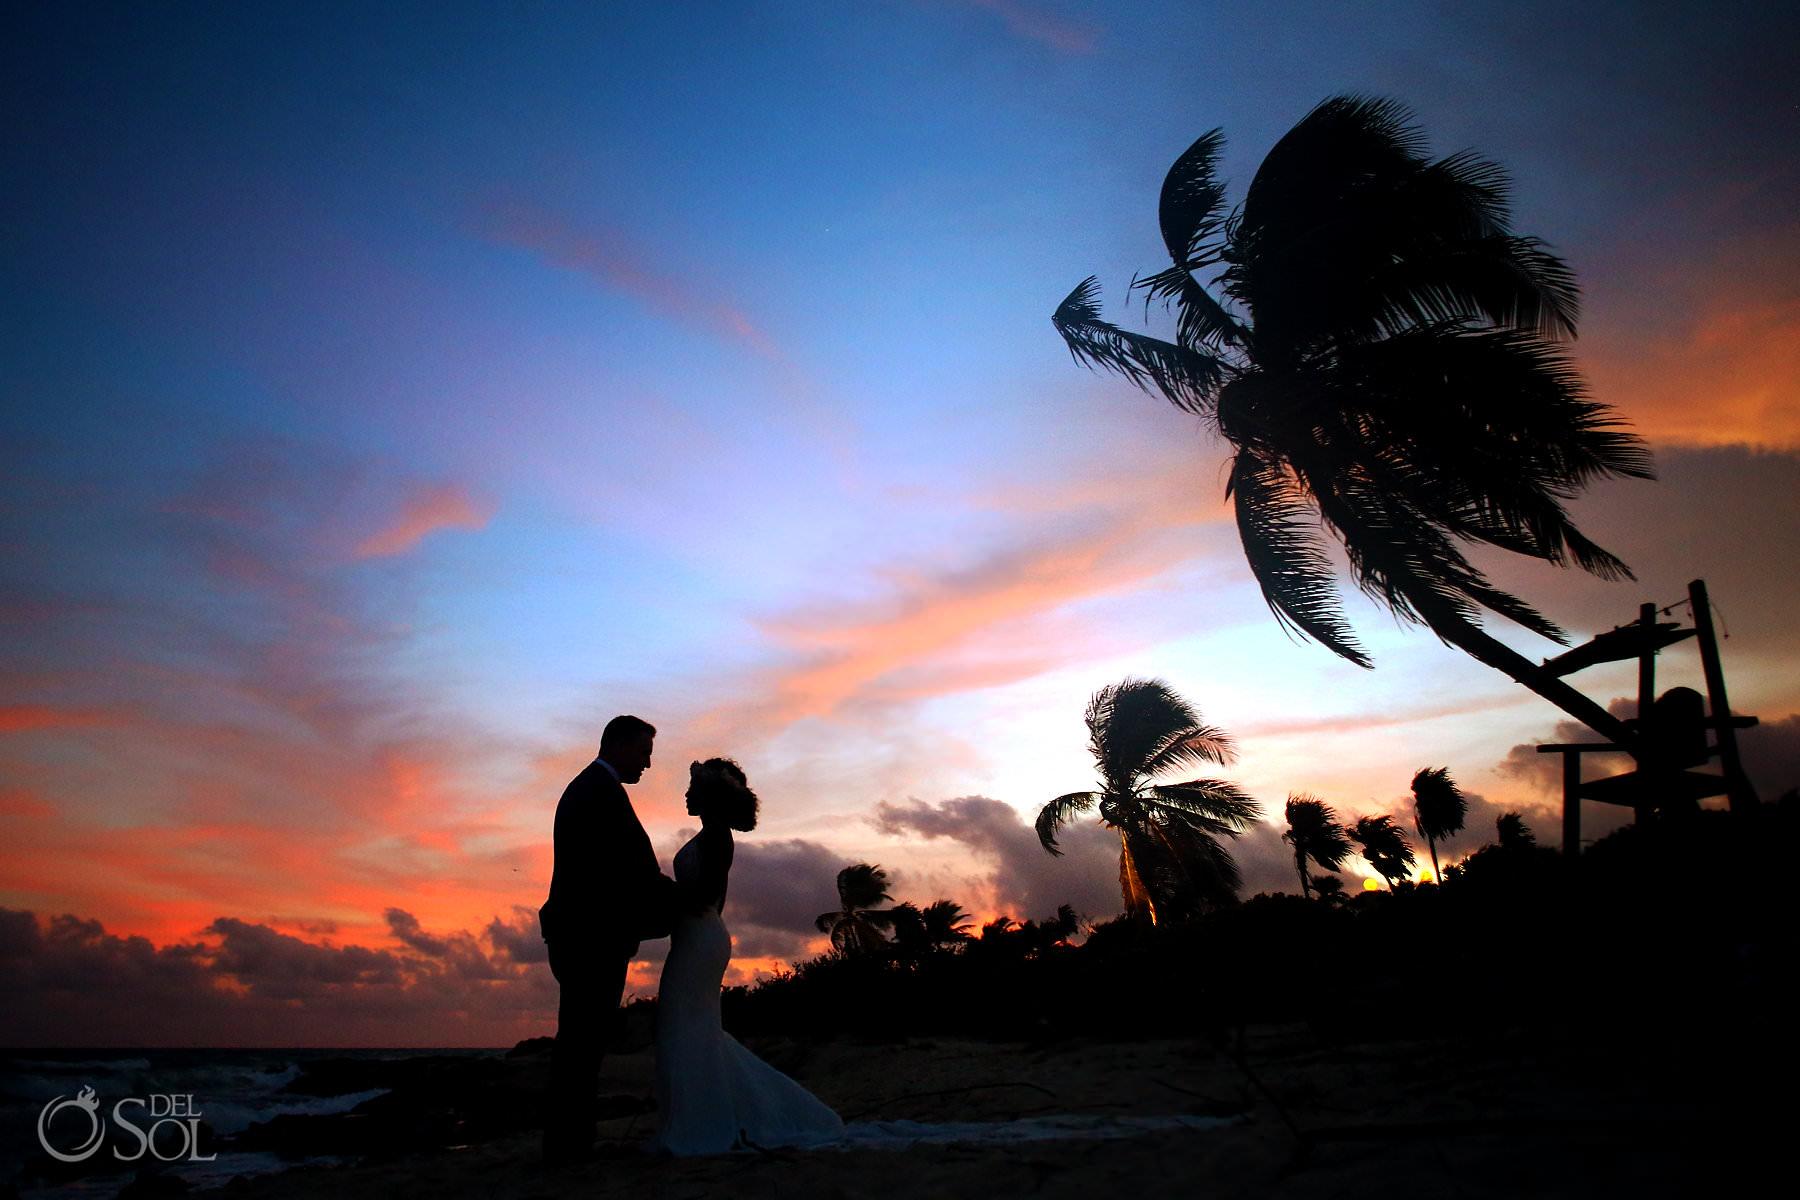 Playa Palmas Sunset portrait silhouette Hotel Xcaret Caleta Wedding Riviera Maya